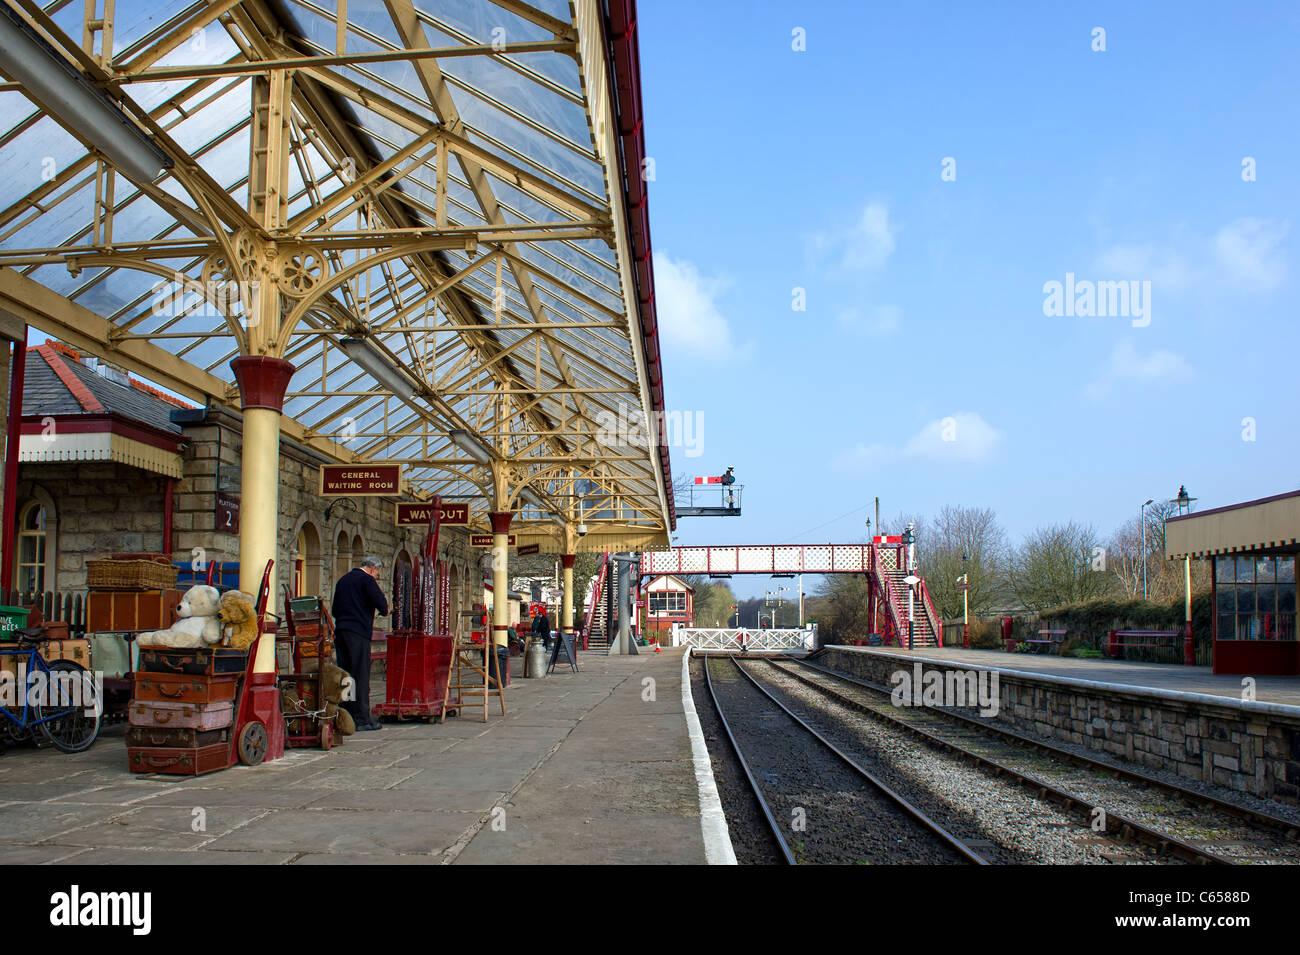 Platform at Ramsbottom Station on the East Lancs Railway - Stock Image